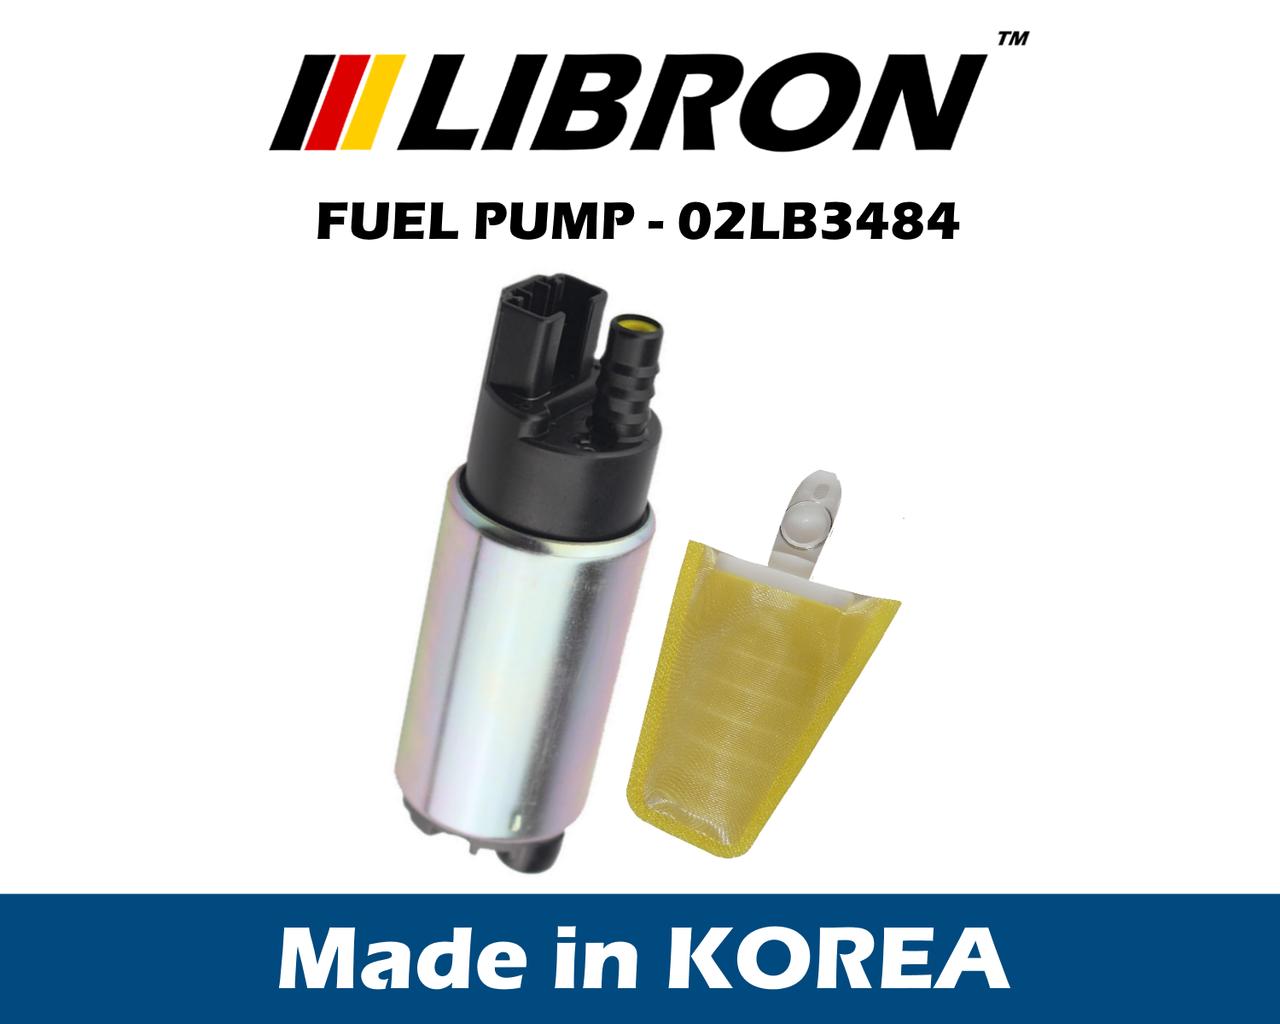 Топливный насос LIBRON 02LB3484 - KIA SHUMA седан